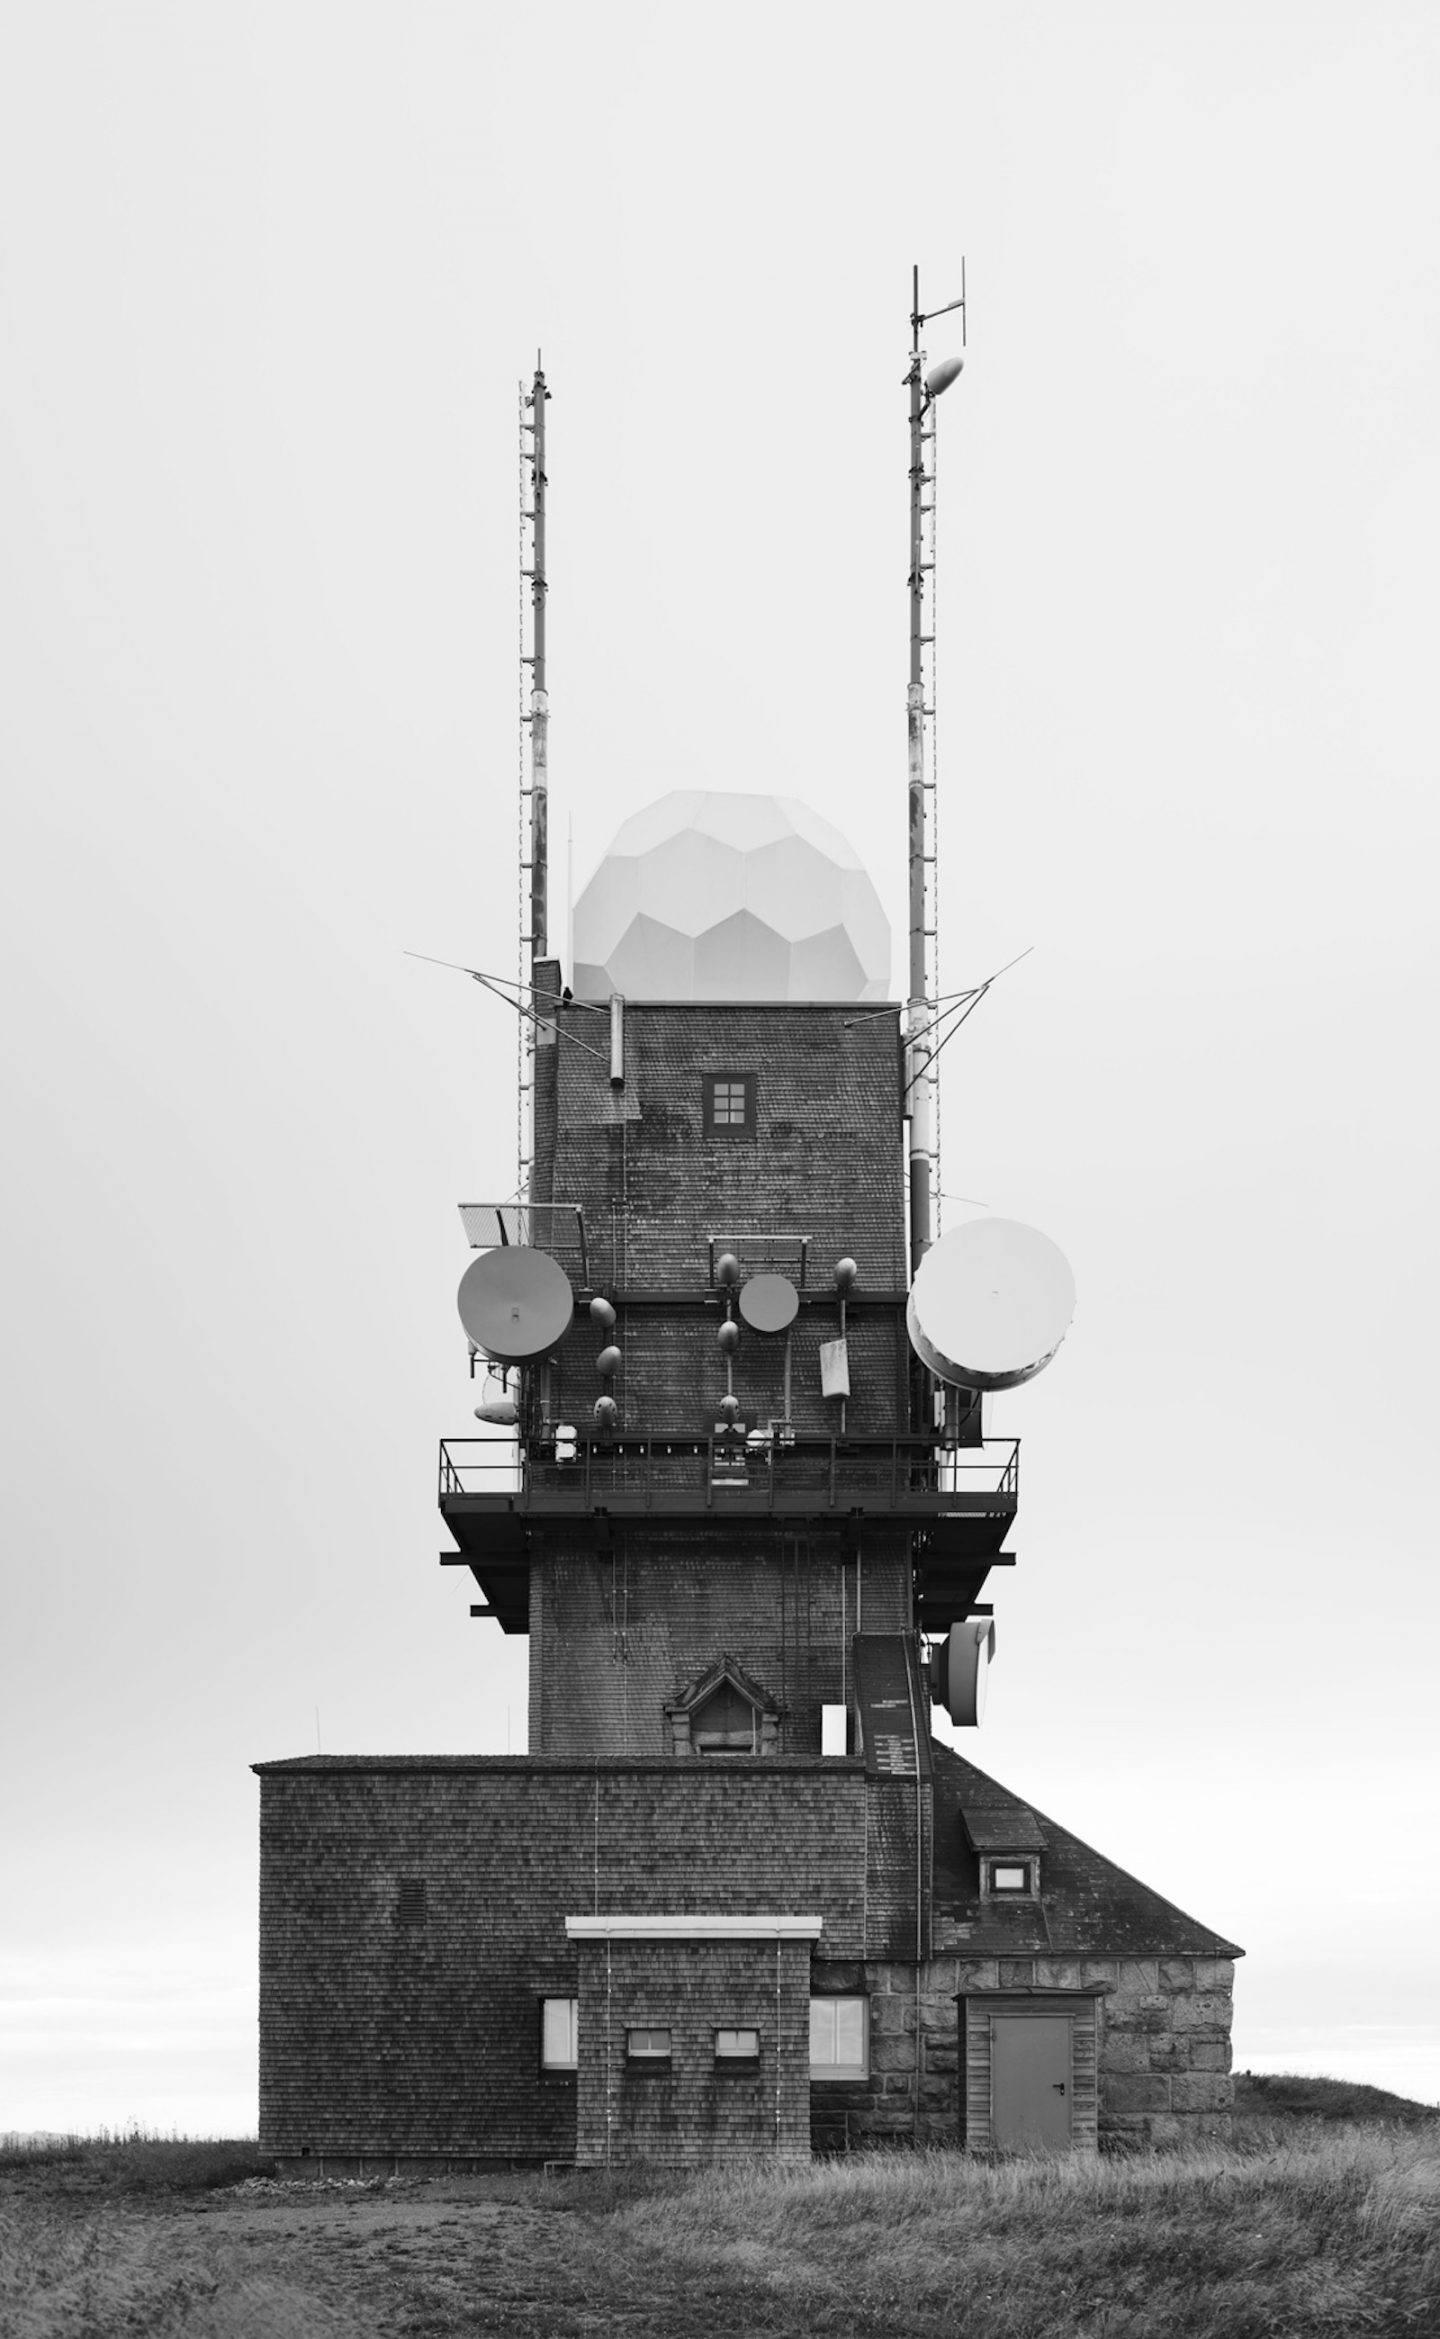 IGNANT-Photography-Michael-Gessner-Masse-12